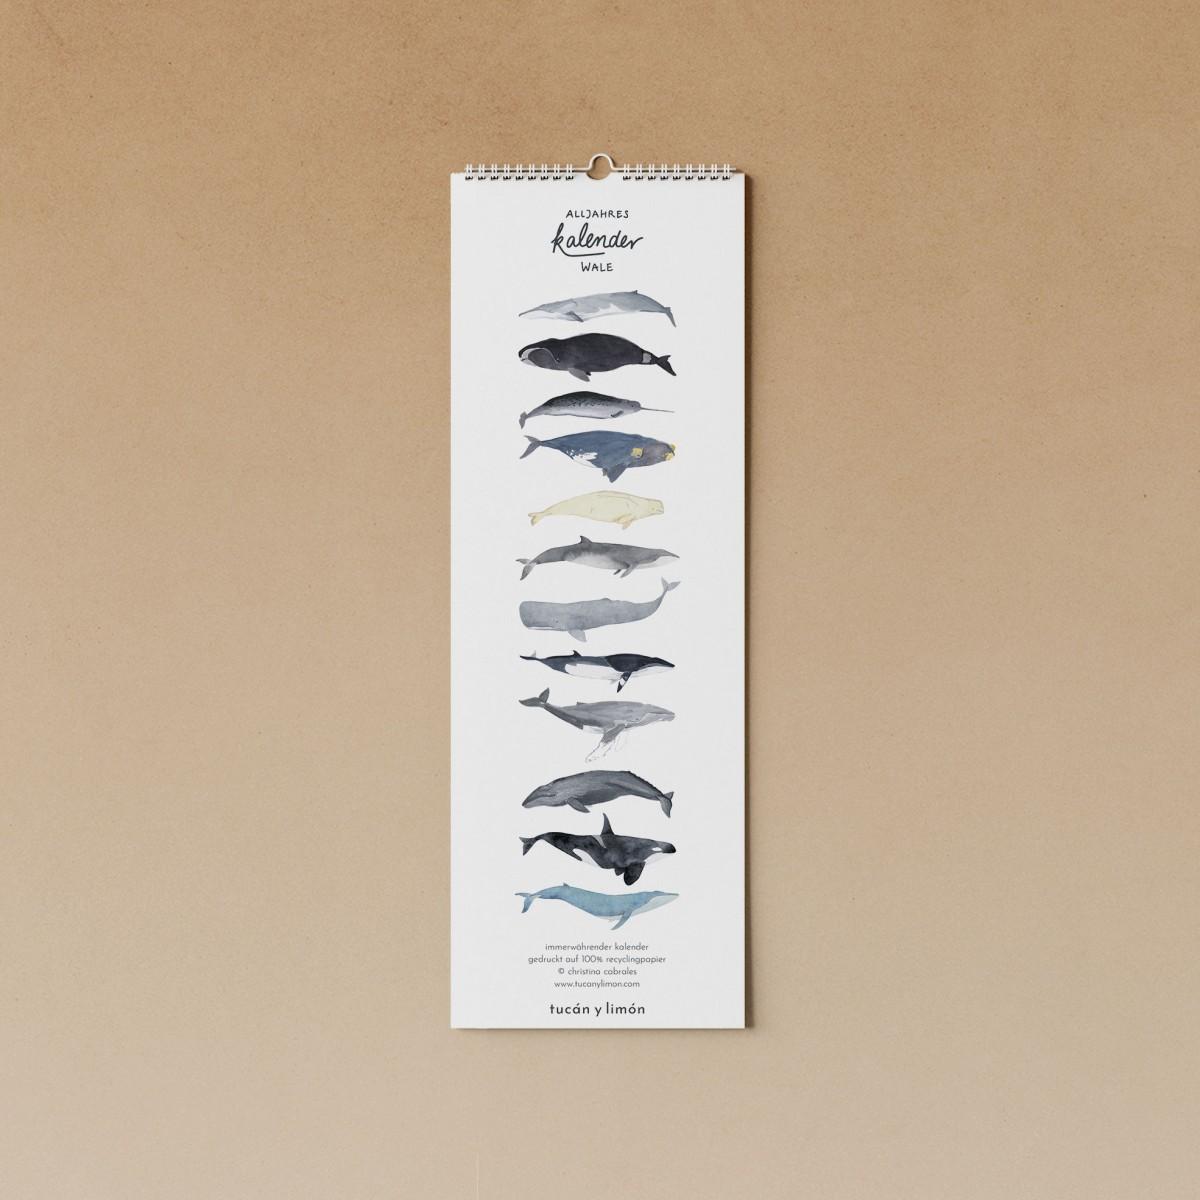 tucán y limón – Geburtstagskalender Wale / Aquarell / 100% Recyclingpapier / A4 halb